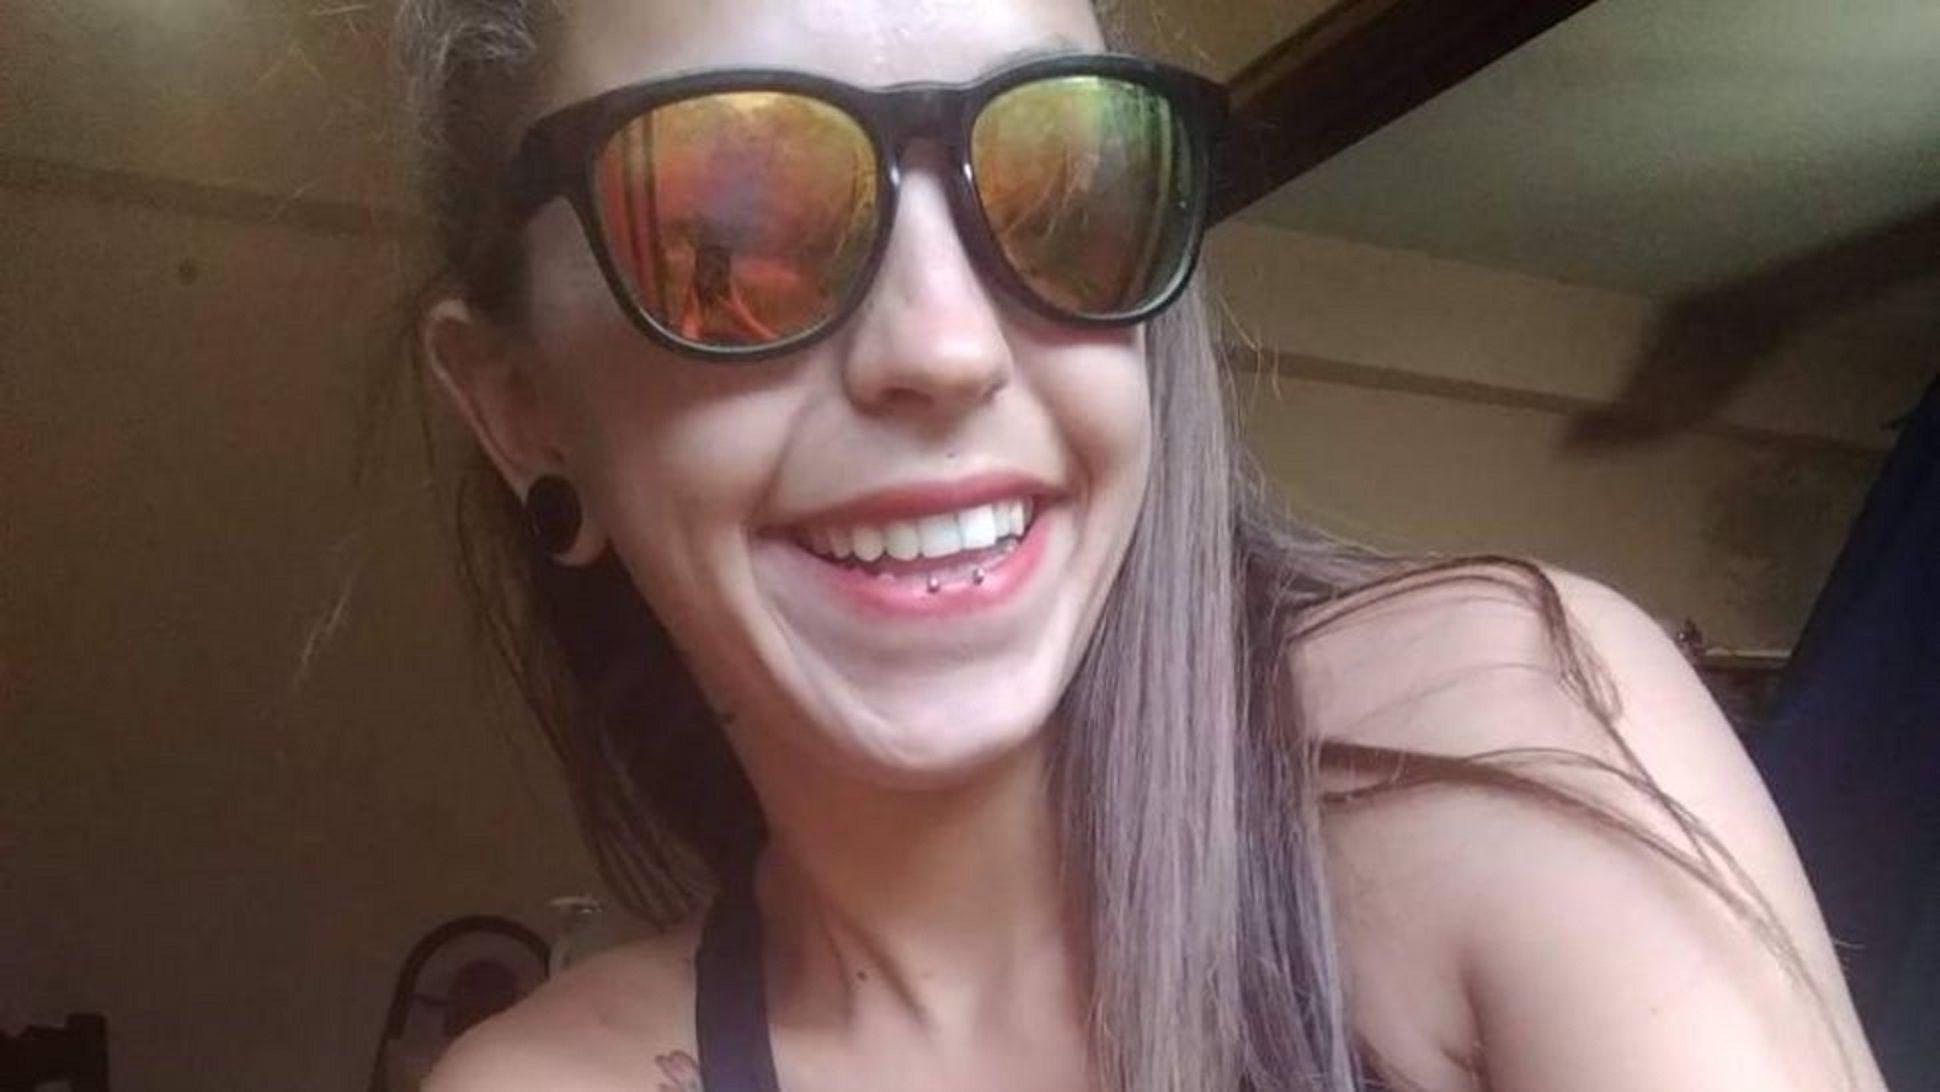 Encontraron muerta a una joven en Zárate: investigan si se trató de un femicidio